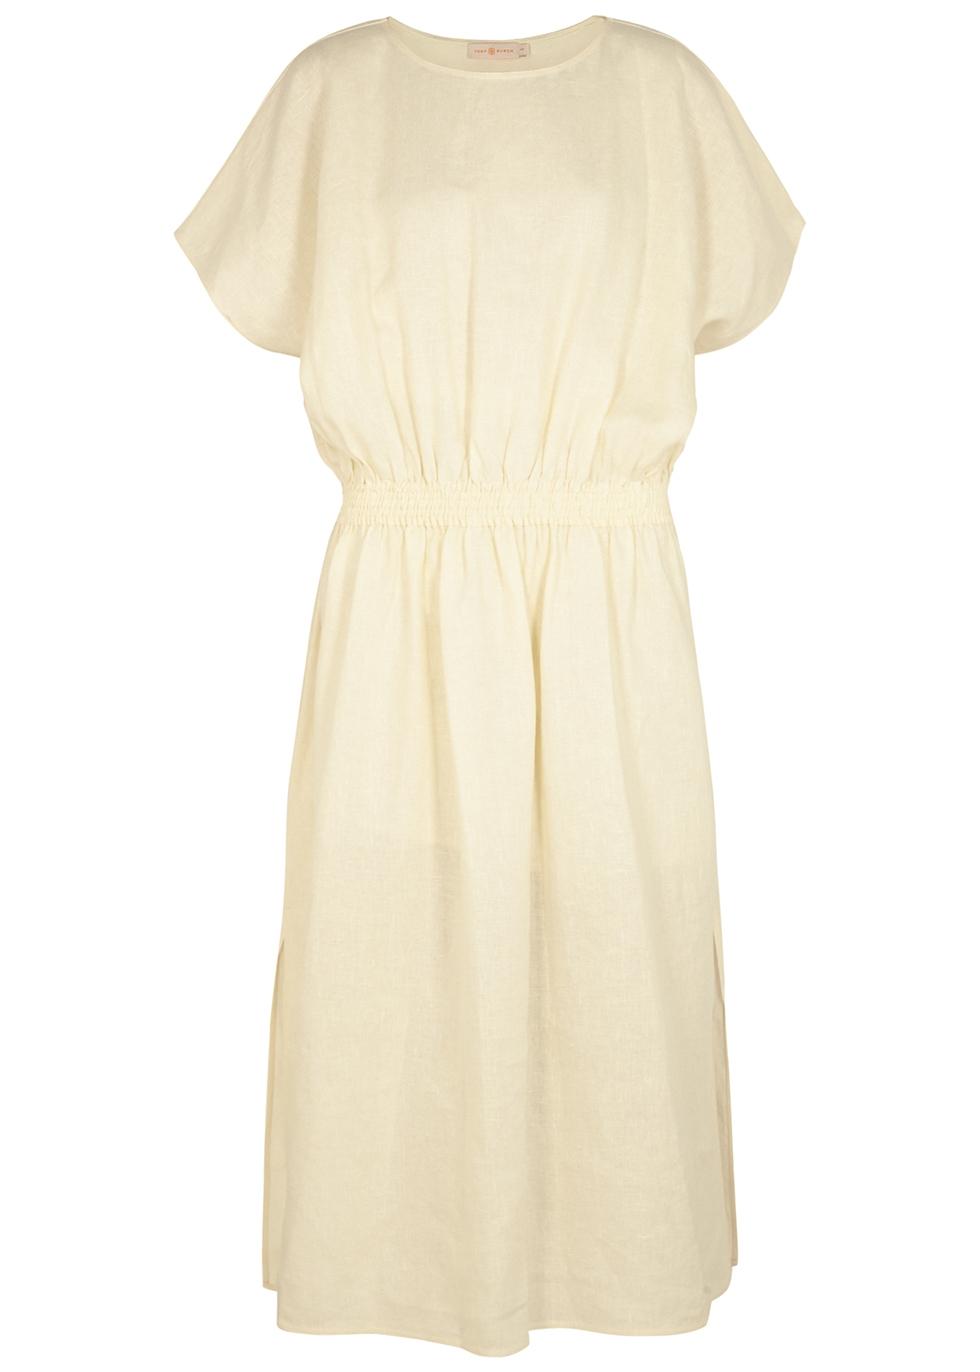 Cream linen midi dress